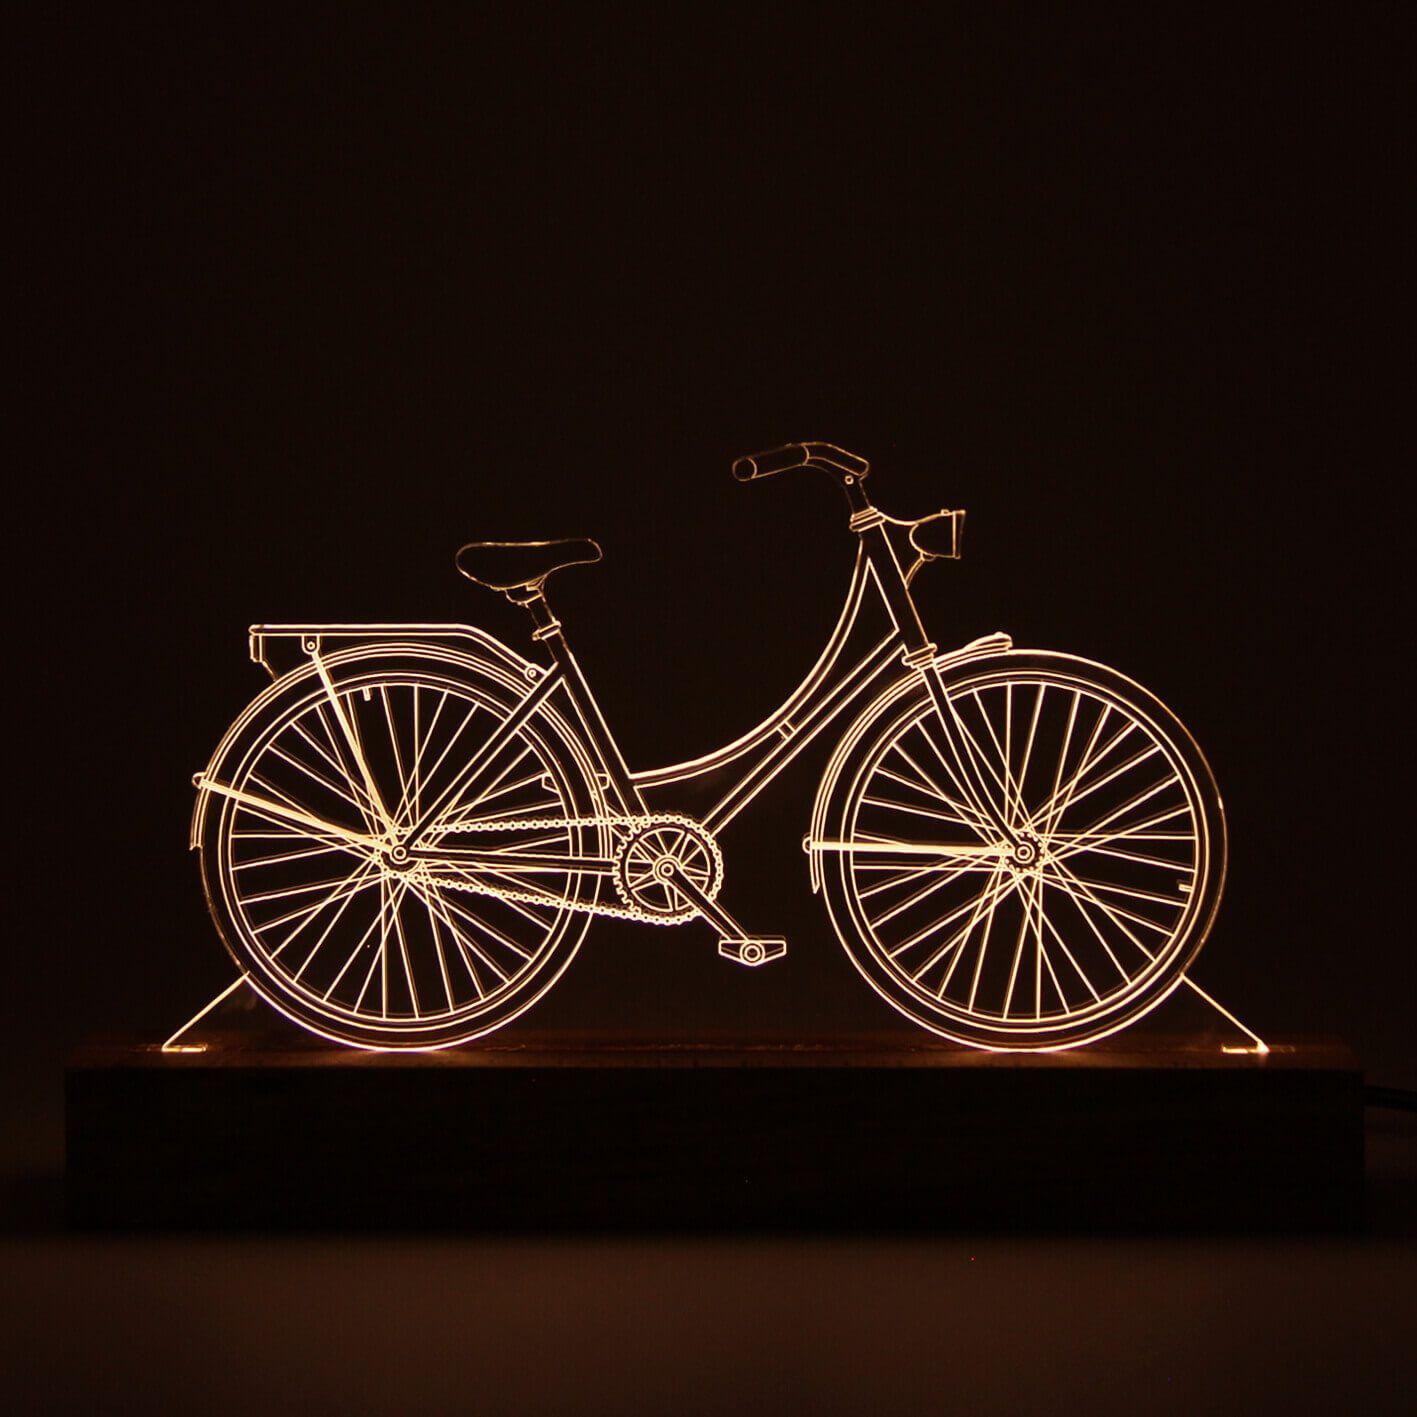 Europa - Luminária Bicicleta Holandesa